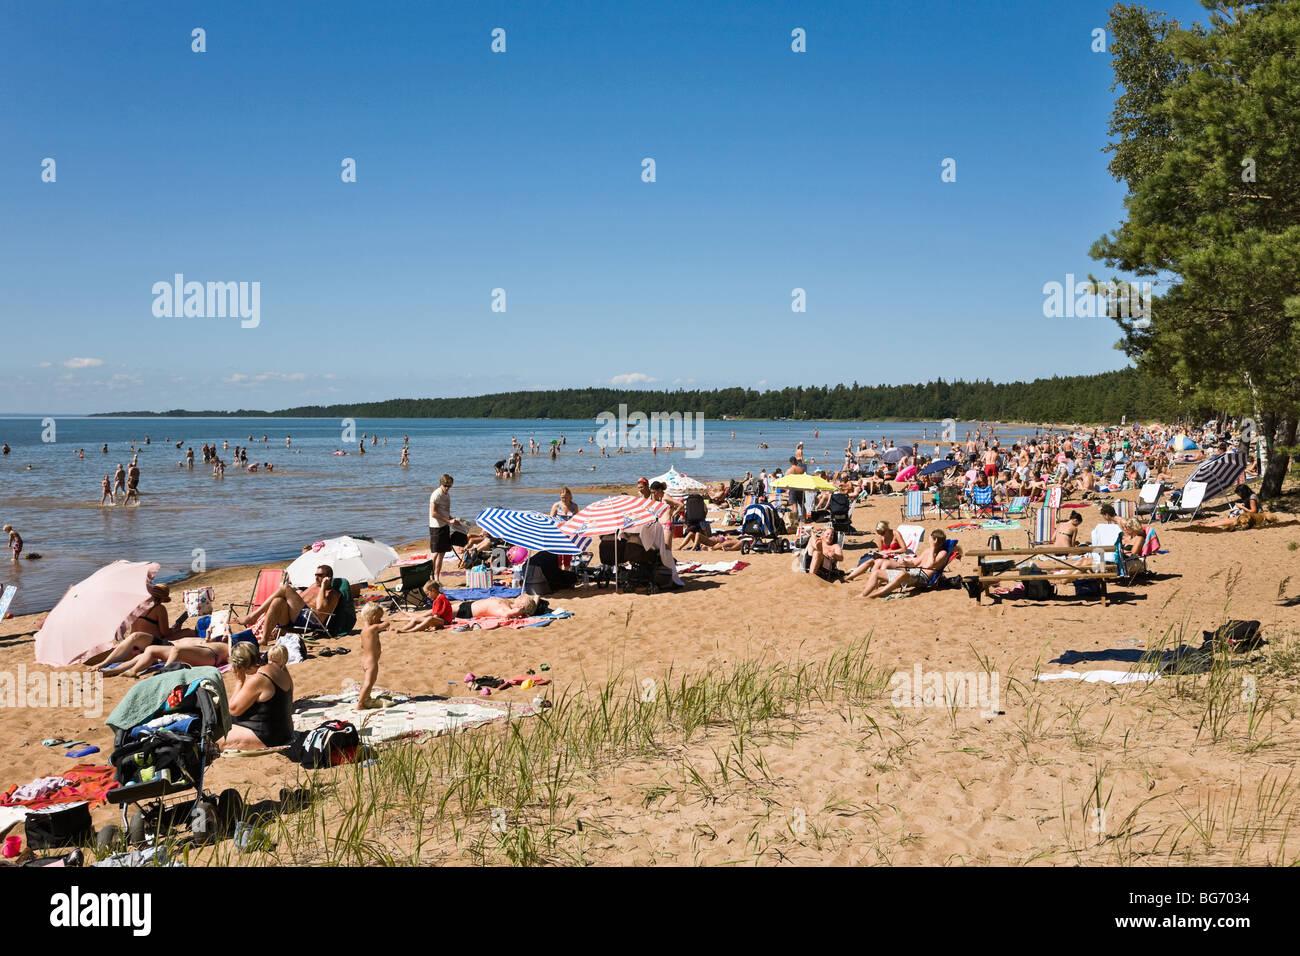 People sunbathing on the beach - Stock Image